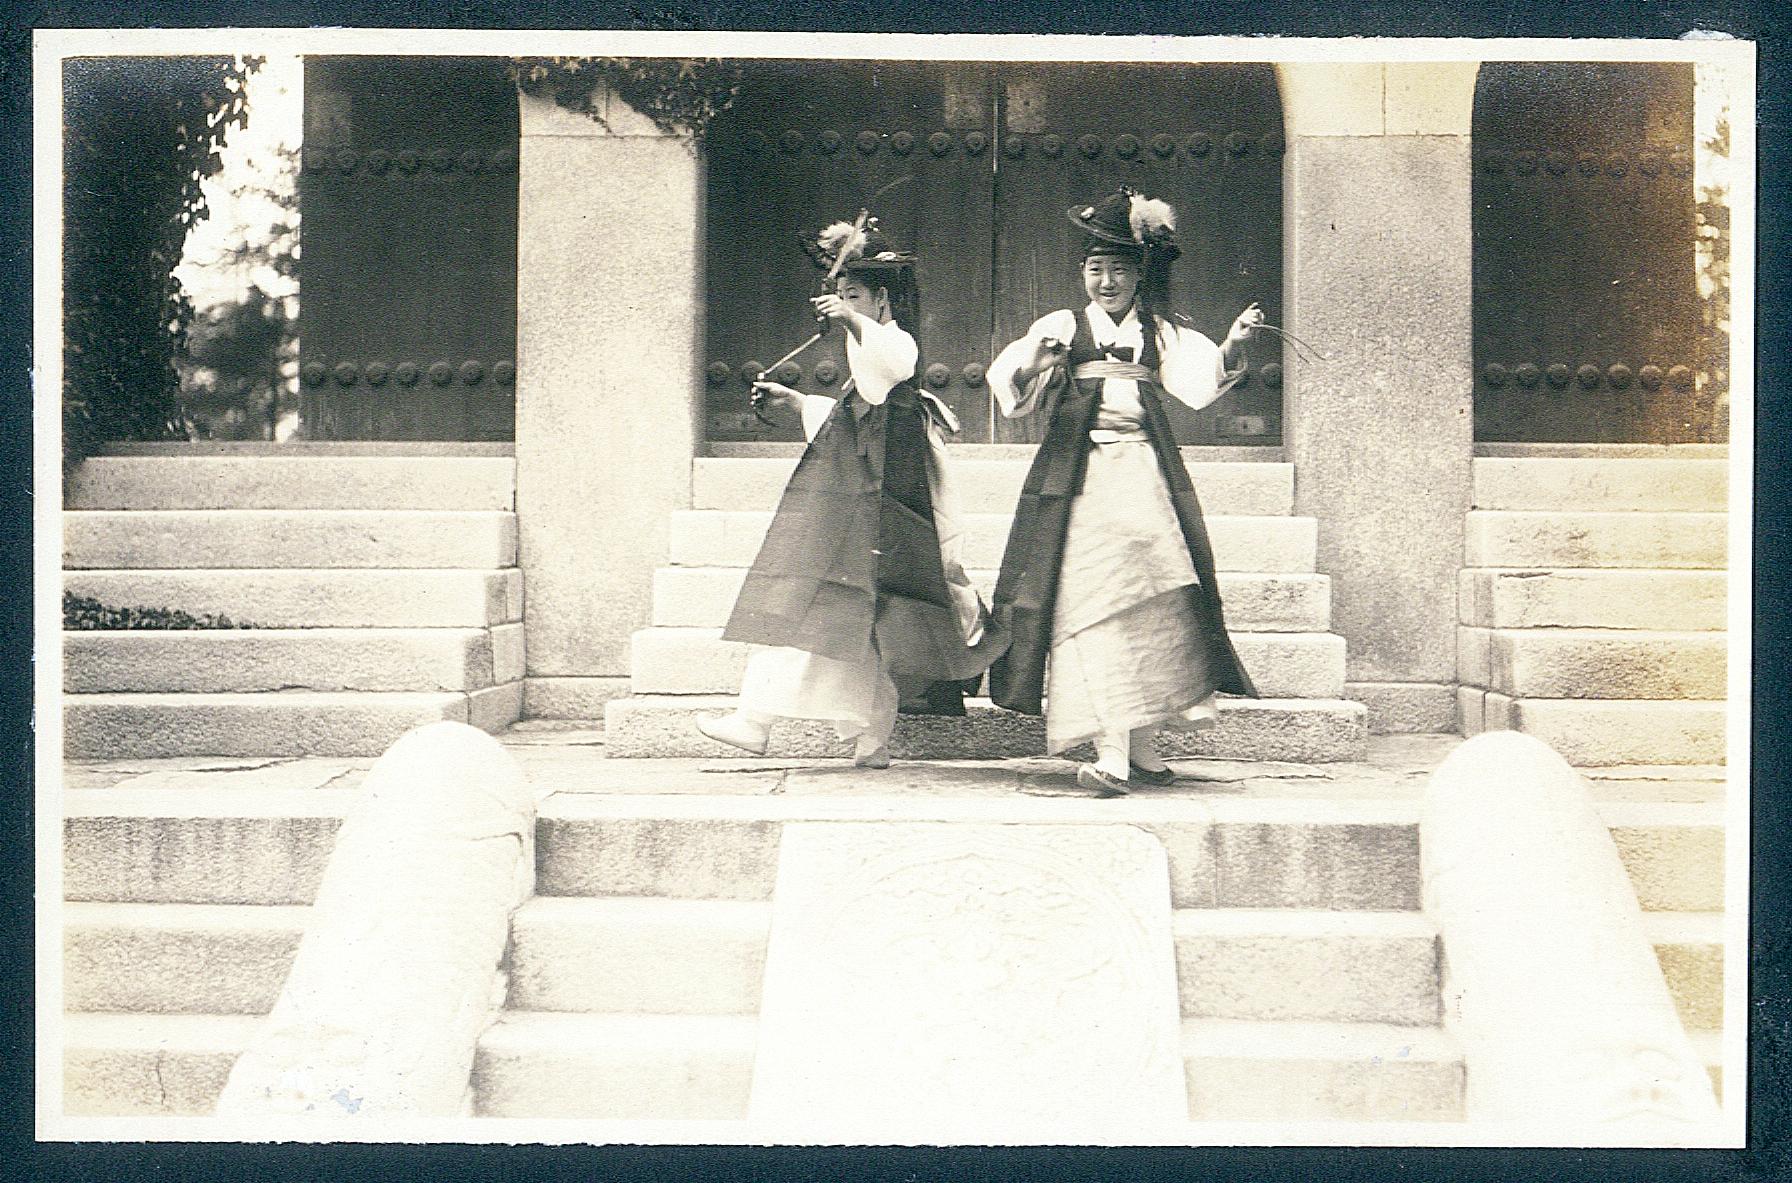 http://archive.museum.seoul.kr:8090/ARCHIVE_DATA/master/1011/A000000247/1815bd55-50af-46ef-adf7-db5f5fe803e0.jpg